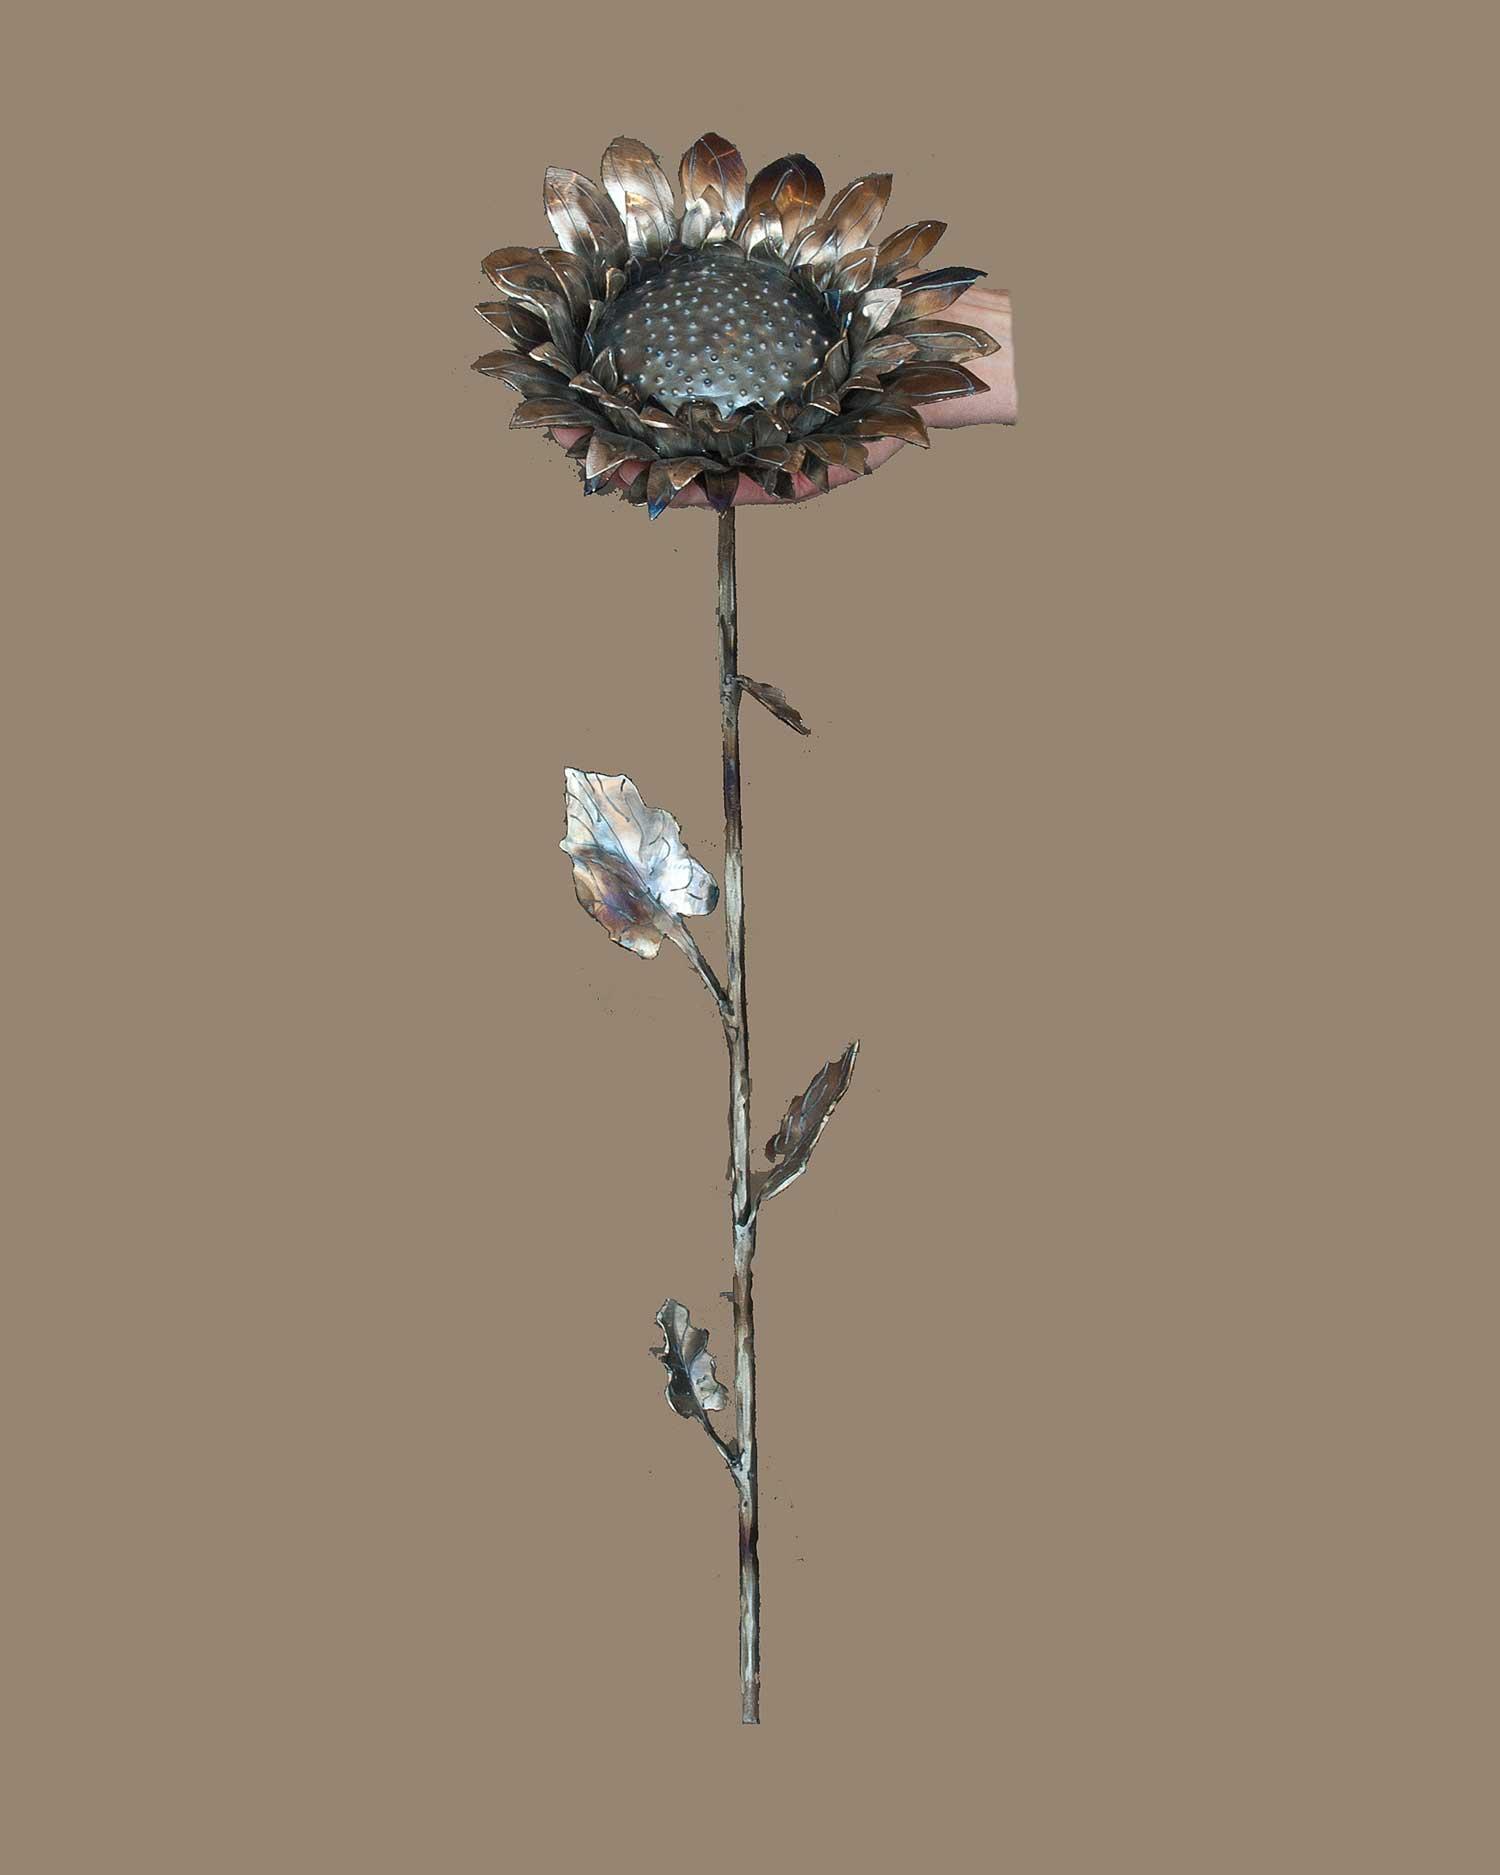 Single Sunflower #1